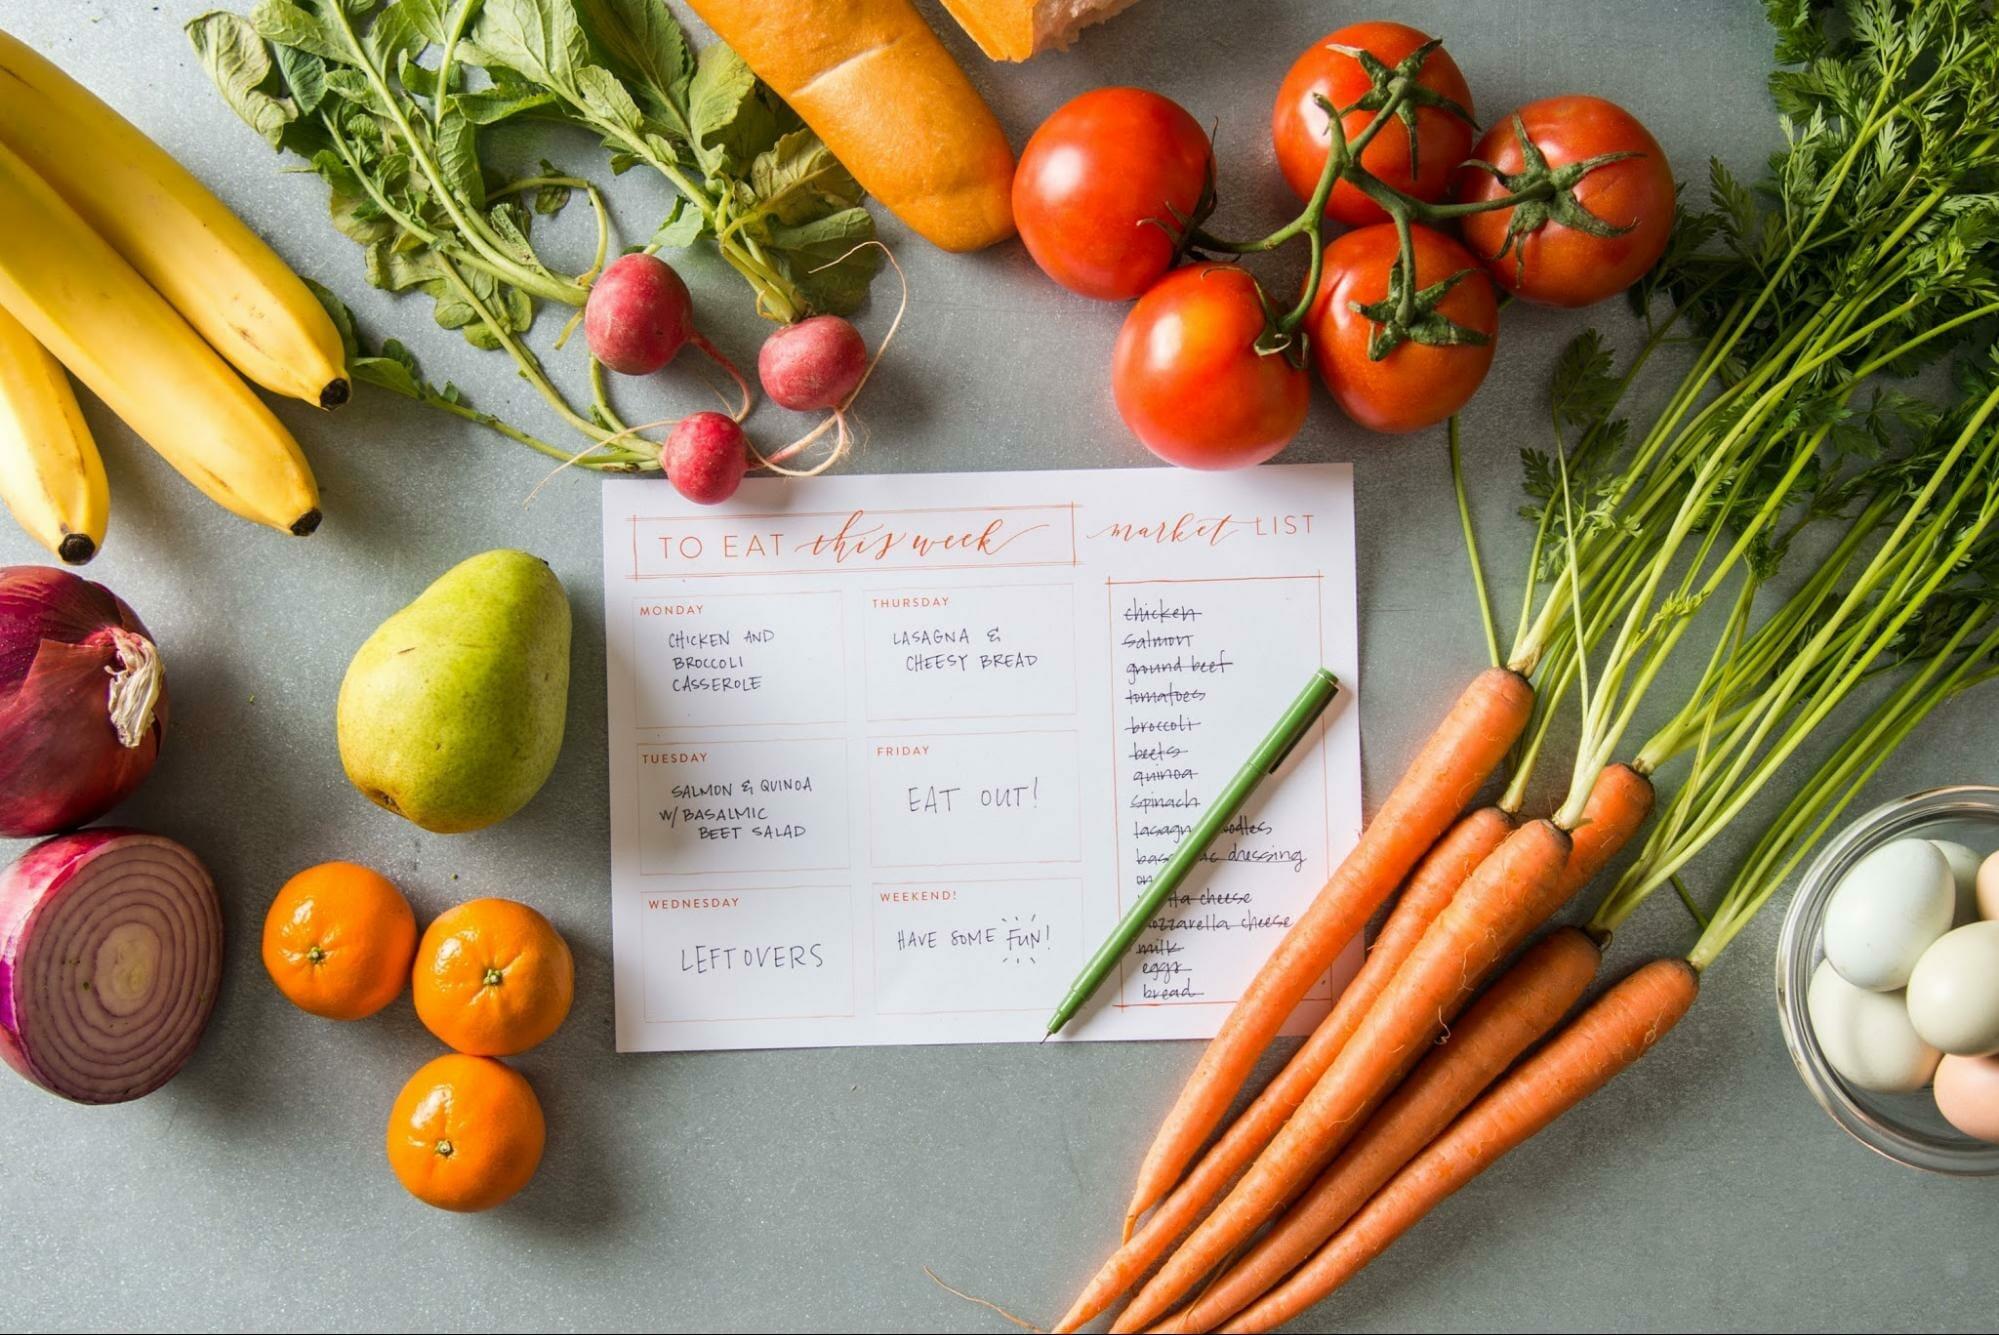 budget-cheap-meals- meal-prep-list